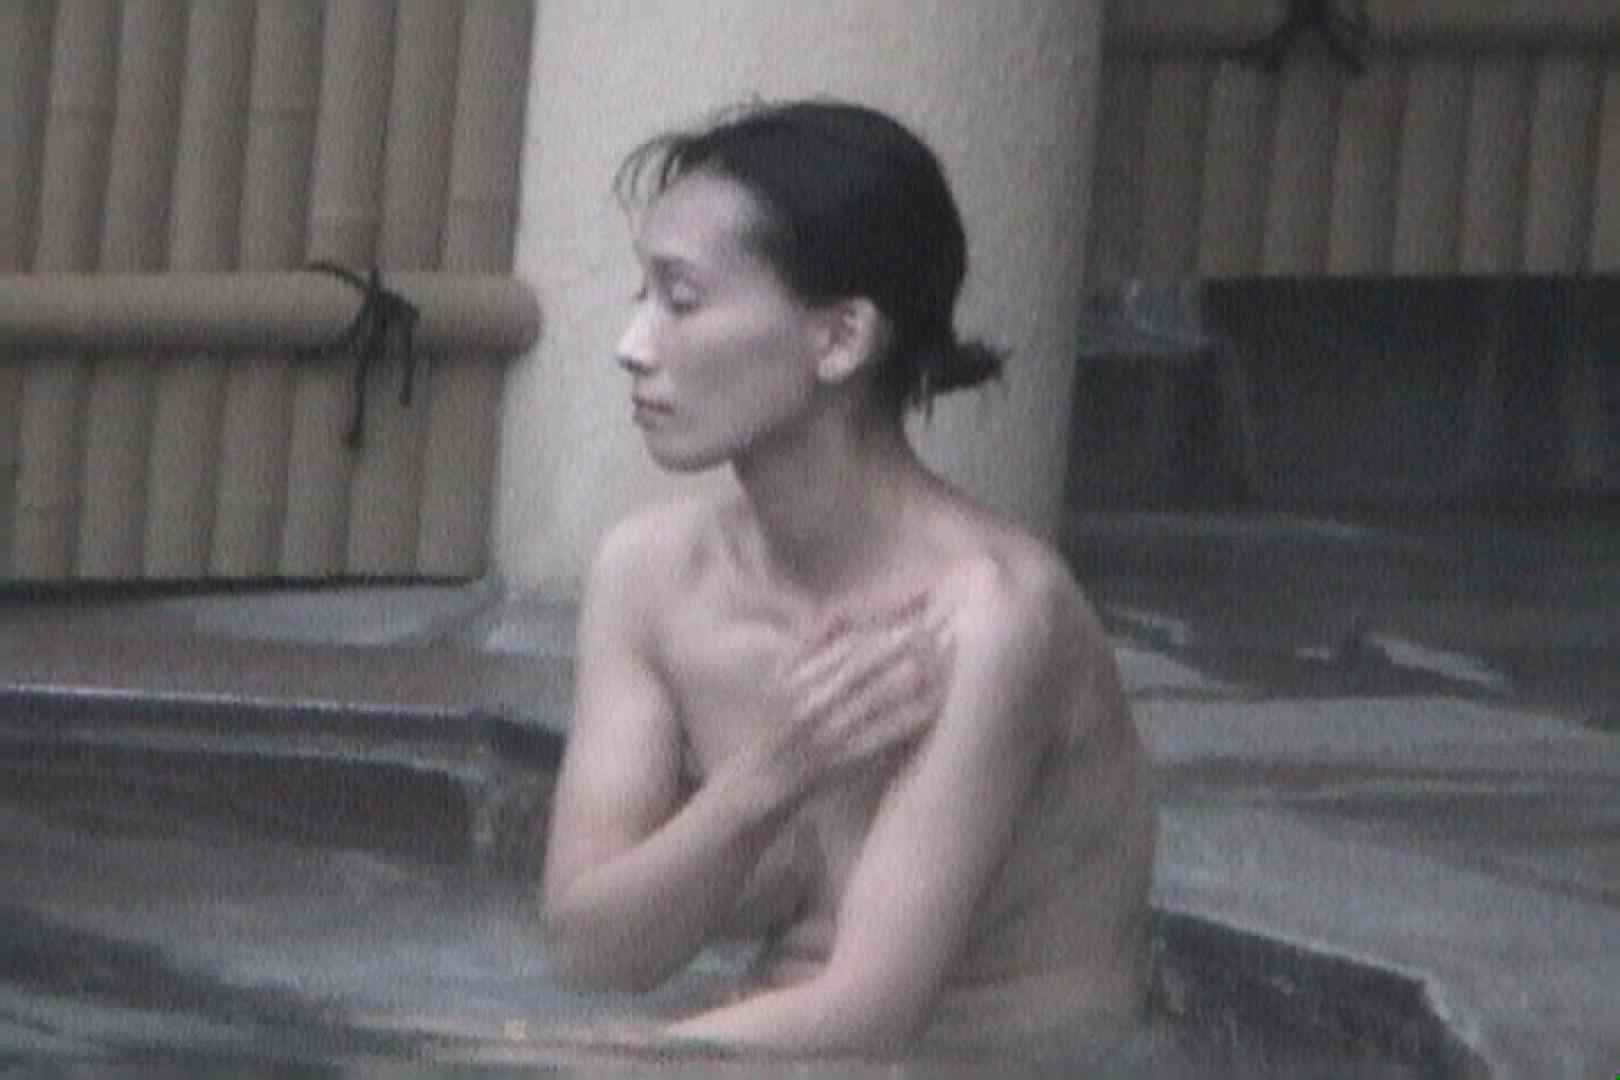 Aquaな露天風呂Vol.557 綺麗なOLたち  78枚 6